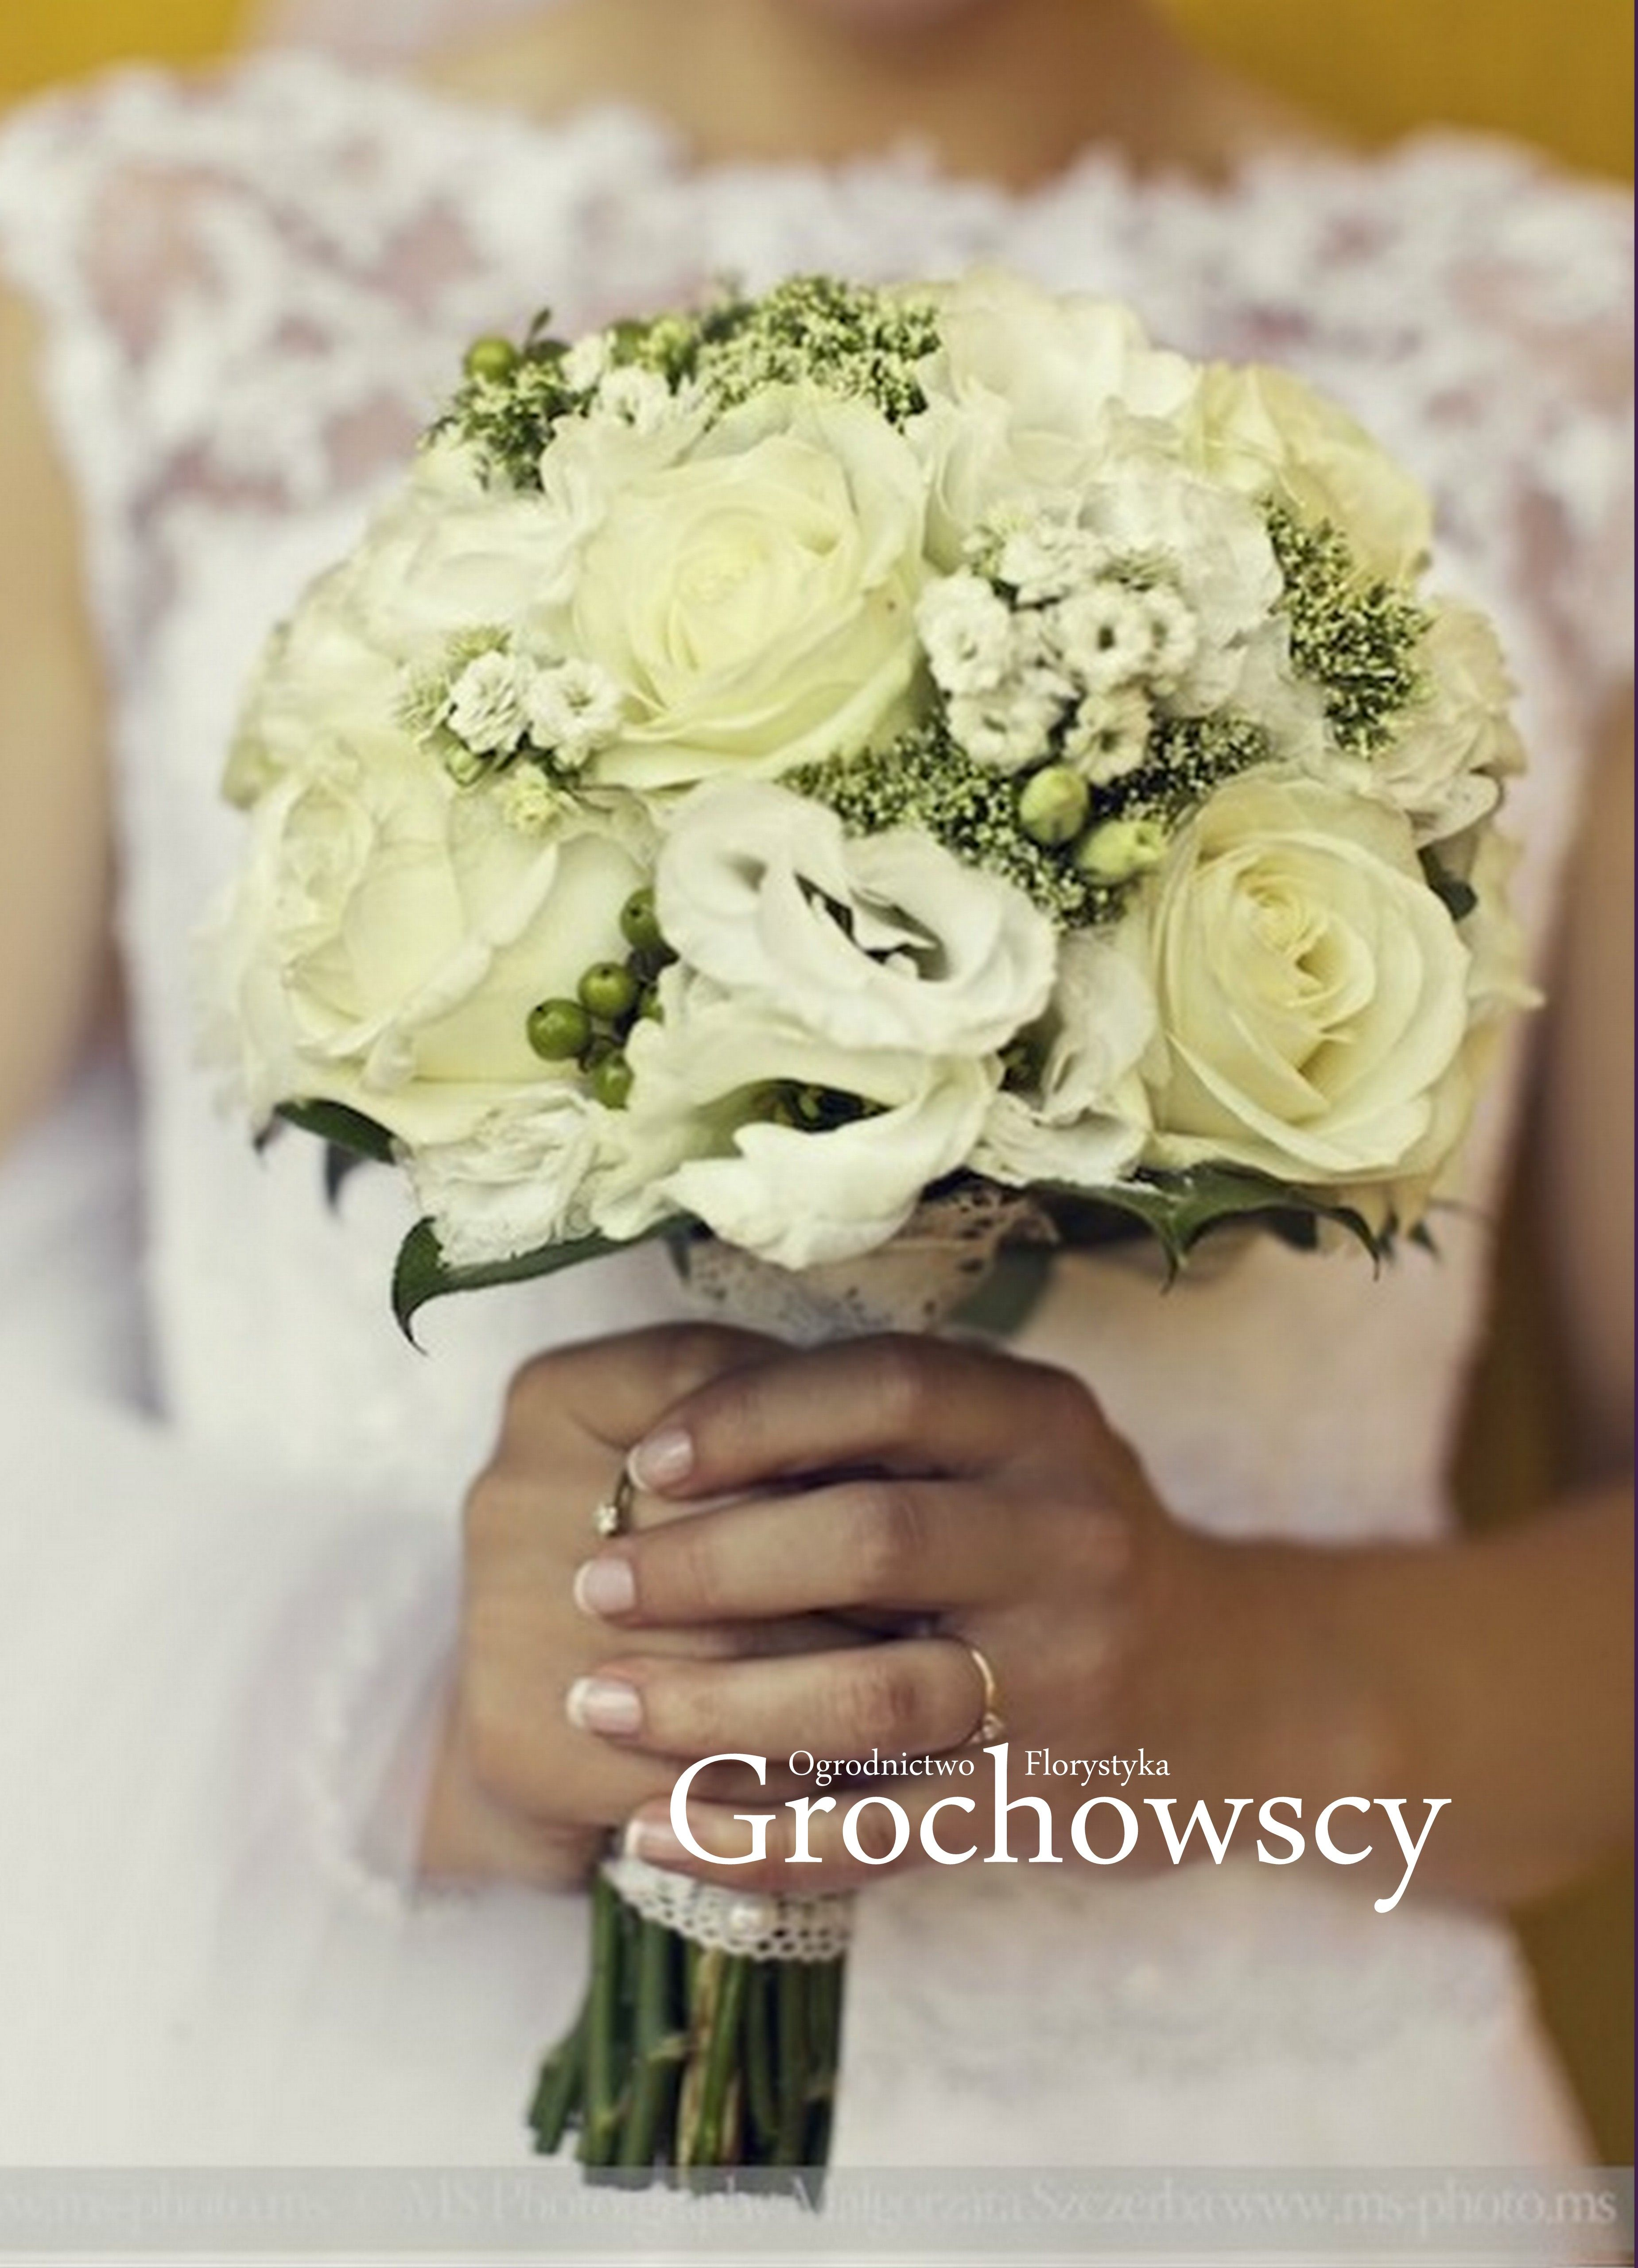 Bukiet Slubny Czluchow Biale Roze Biala Eustoma Bialy Bukiet Slubny White Roses Wedding Bouquet Wedding Bouquets Flowers Bouquet Wedding Flowers